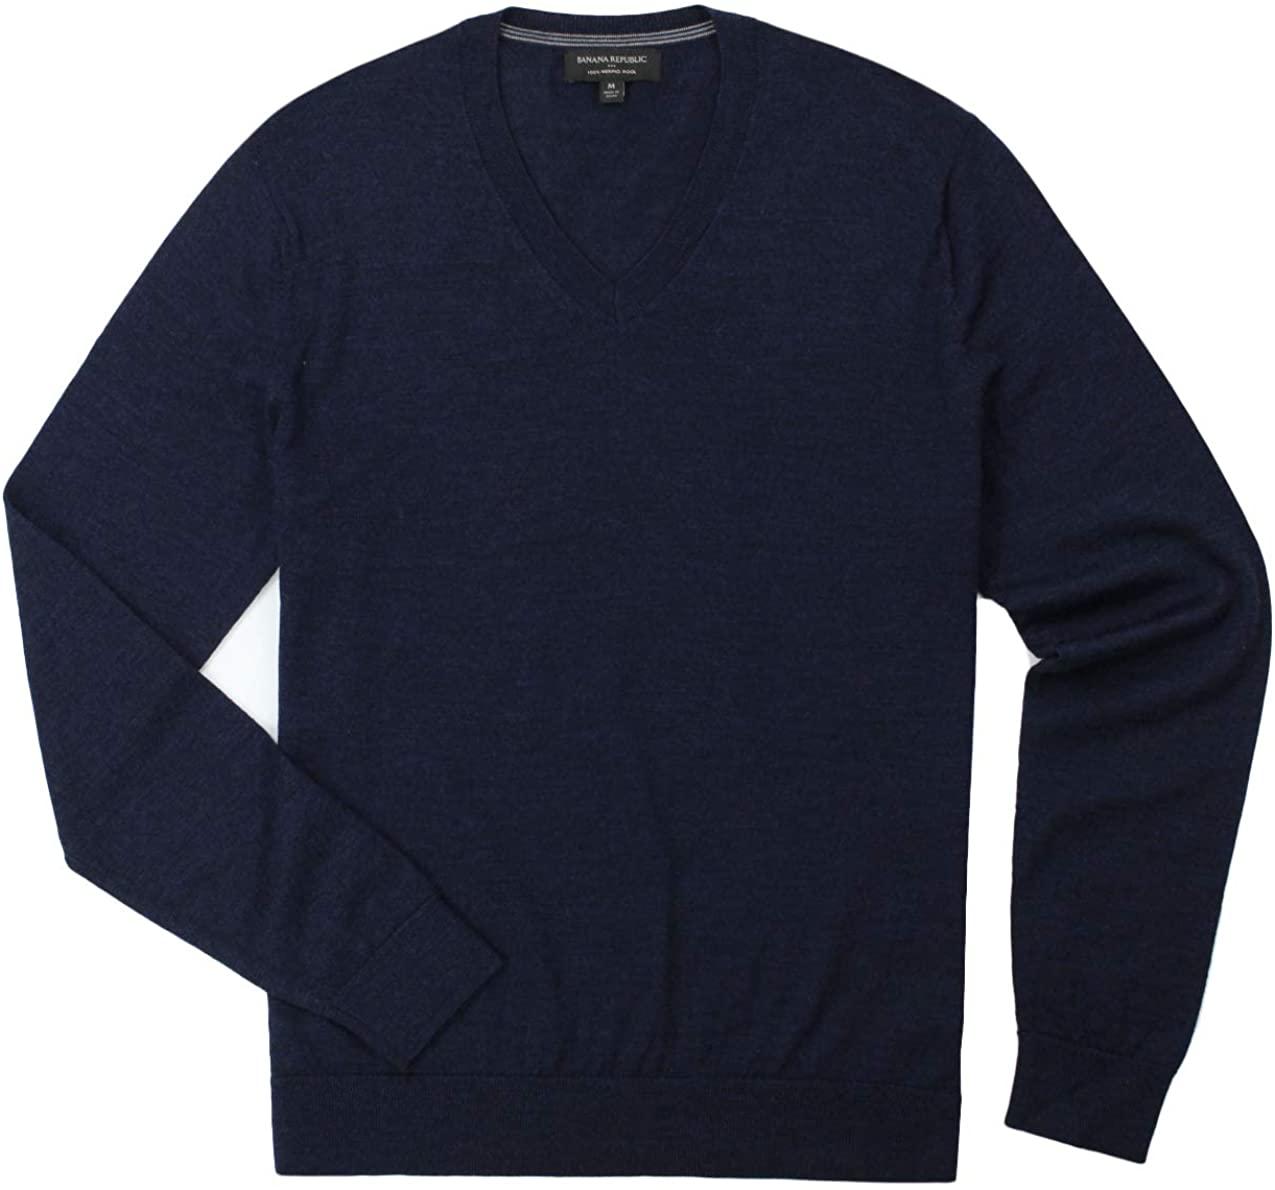 BANANA REPUBLIC - Men's - Merino Wool V-Neck Sweater